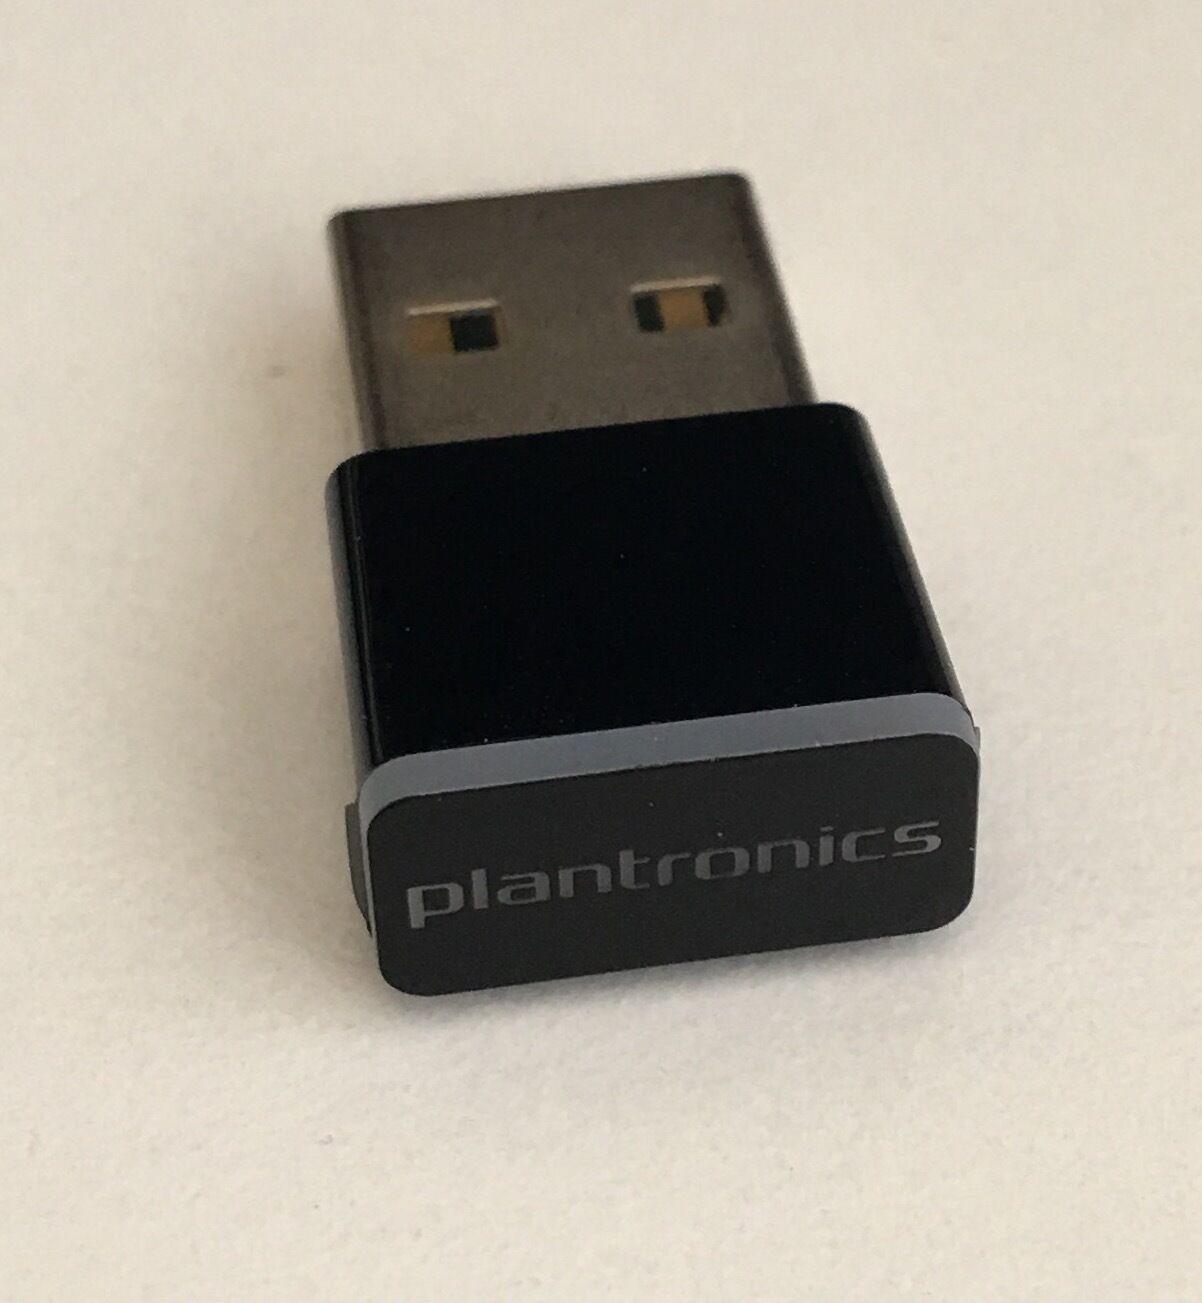 d4c9e43c161 Plantronics P/N 205250-01. Plantronics BT600 UC Standard Version USB  Bluetooth Dongle ...